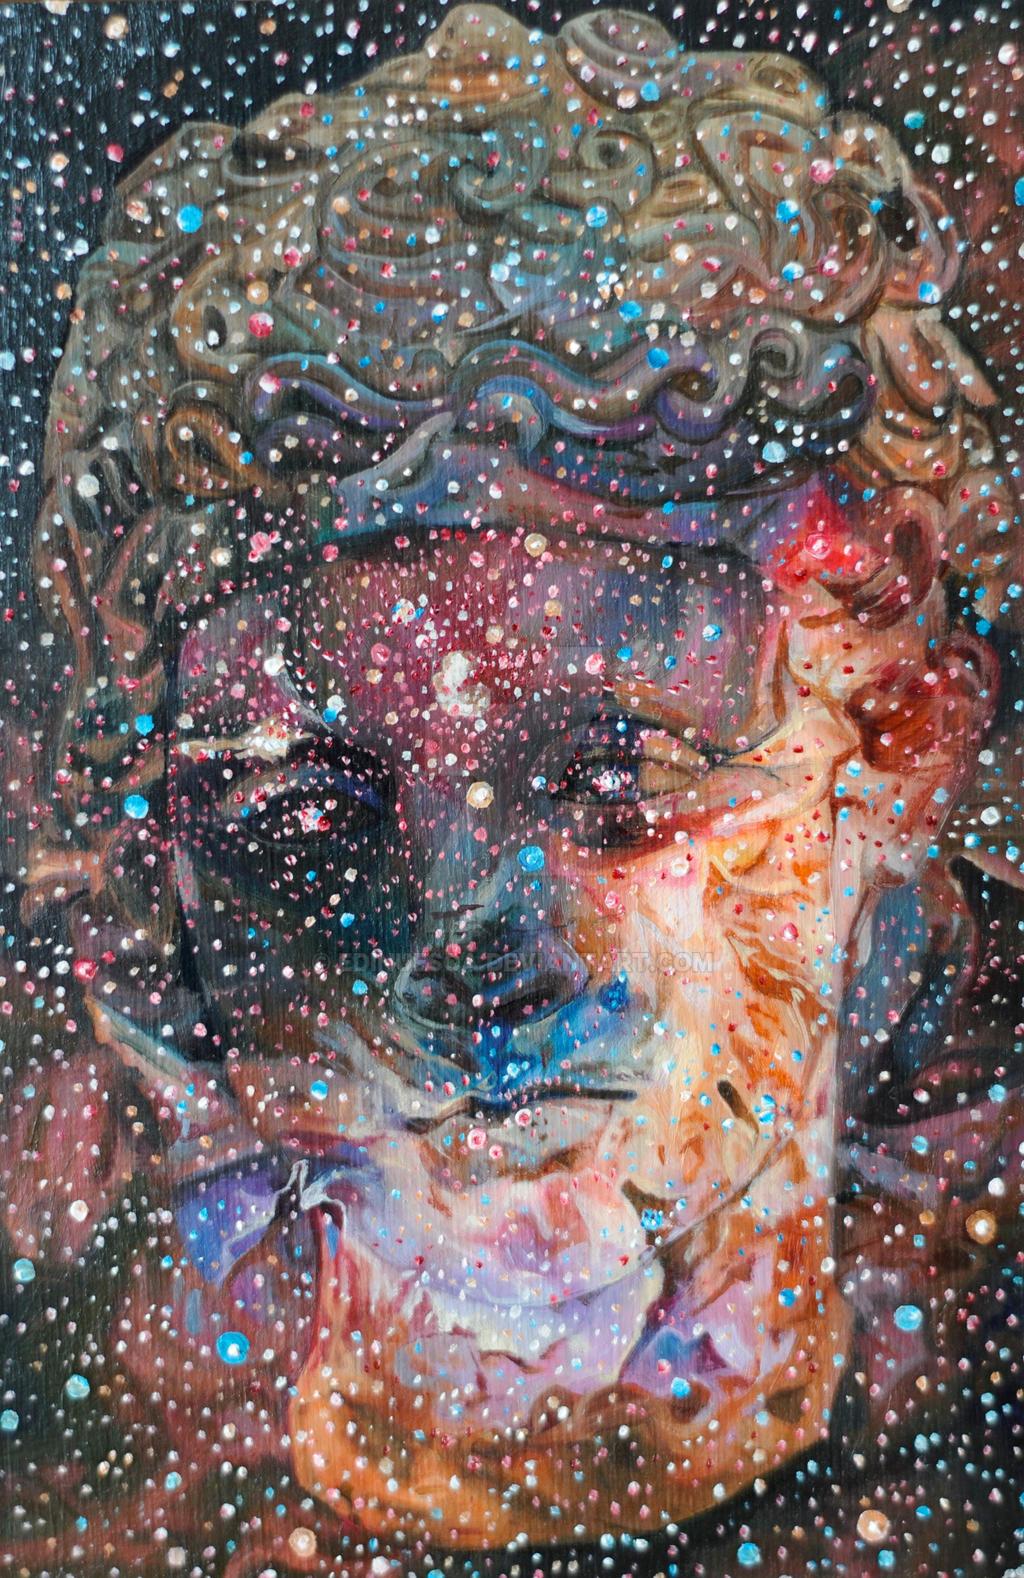 Apollo by Edinuesca on DeviantArt